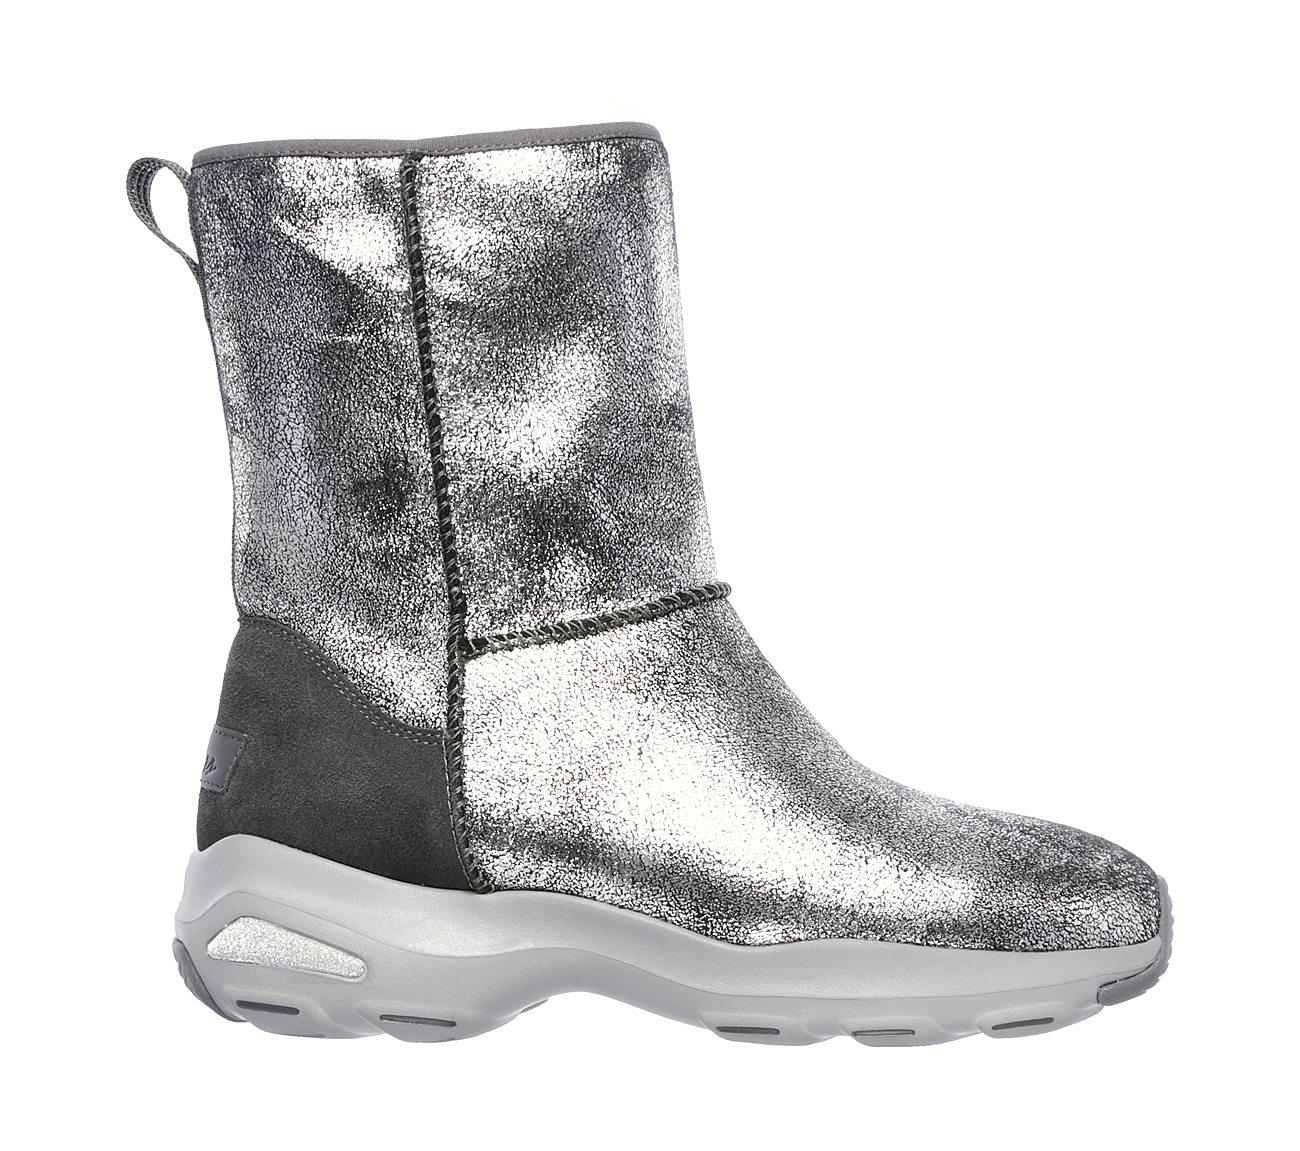 Refinar Trasplante Inmundo  Buy SKECHERS D'Lites Ultra - Temp Skechers D'Lites Shoes